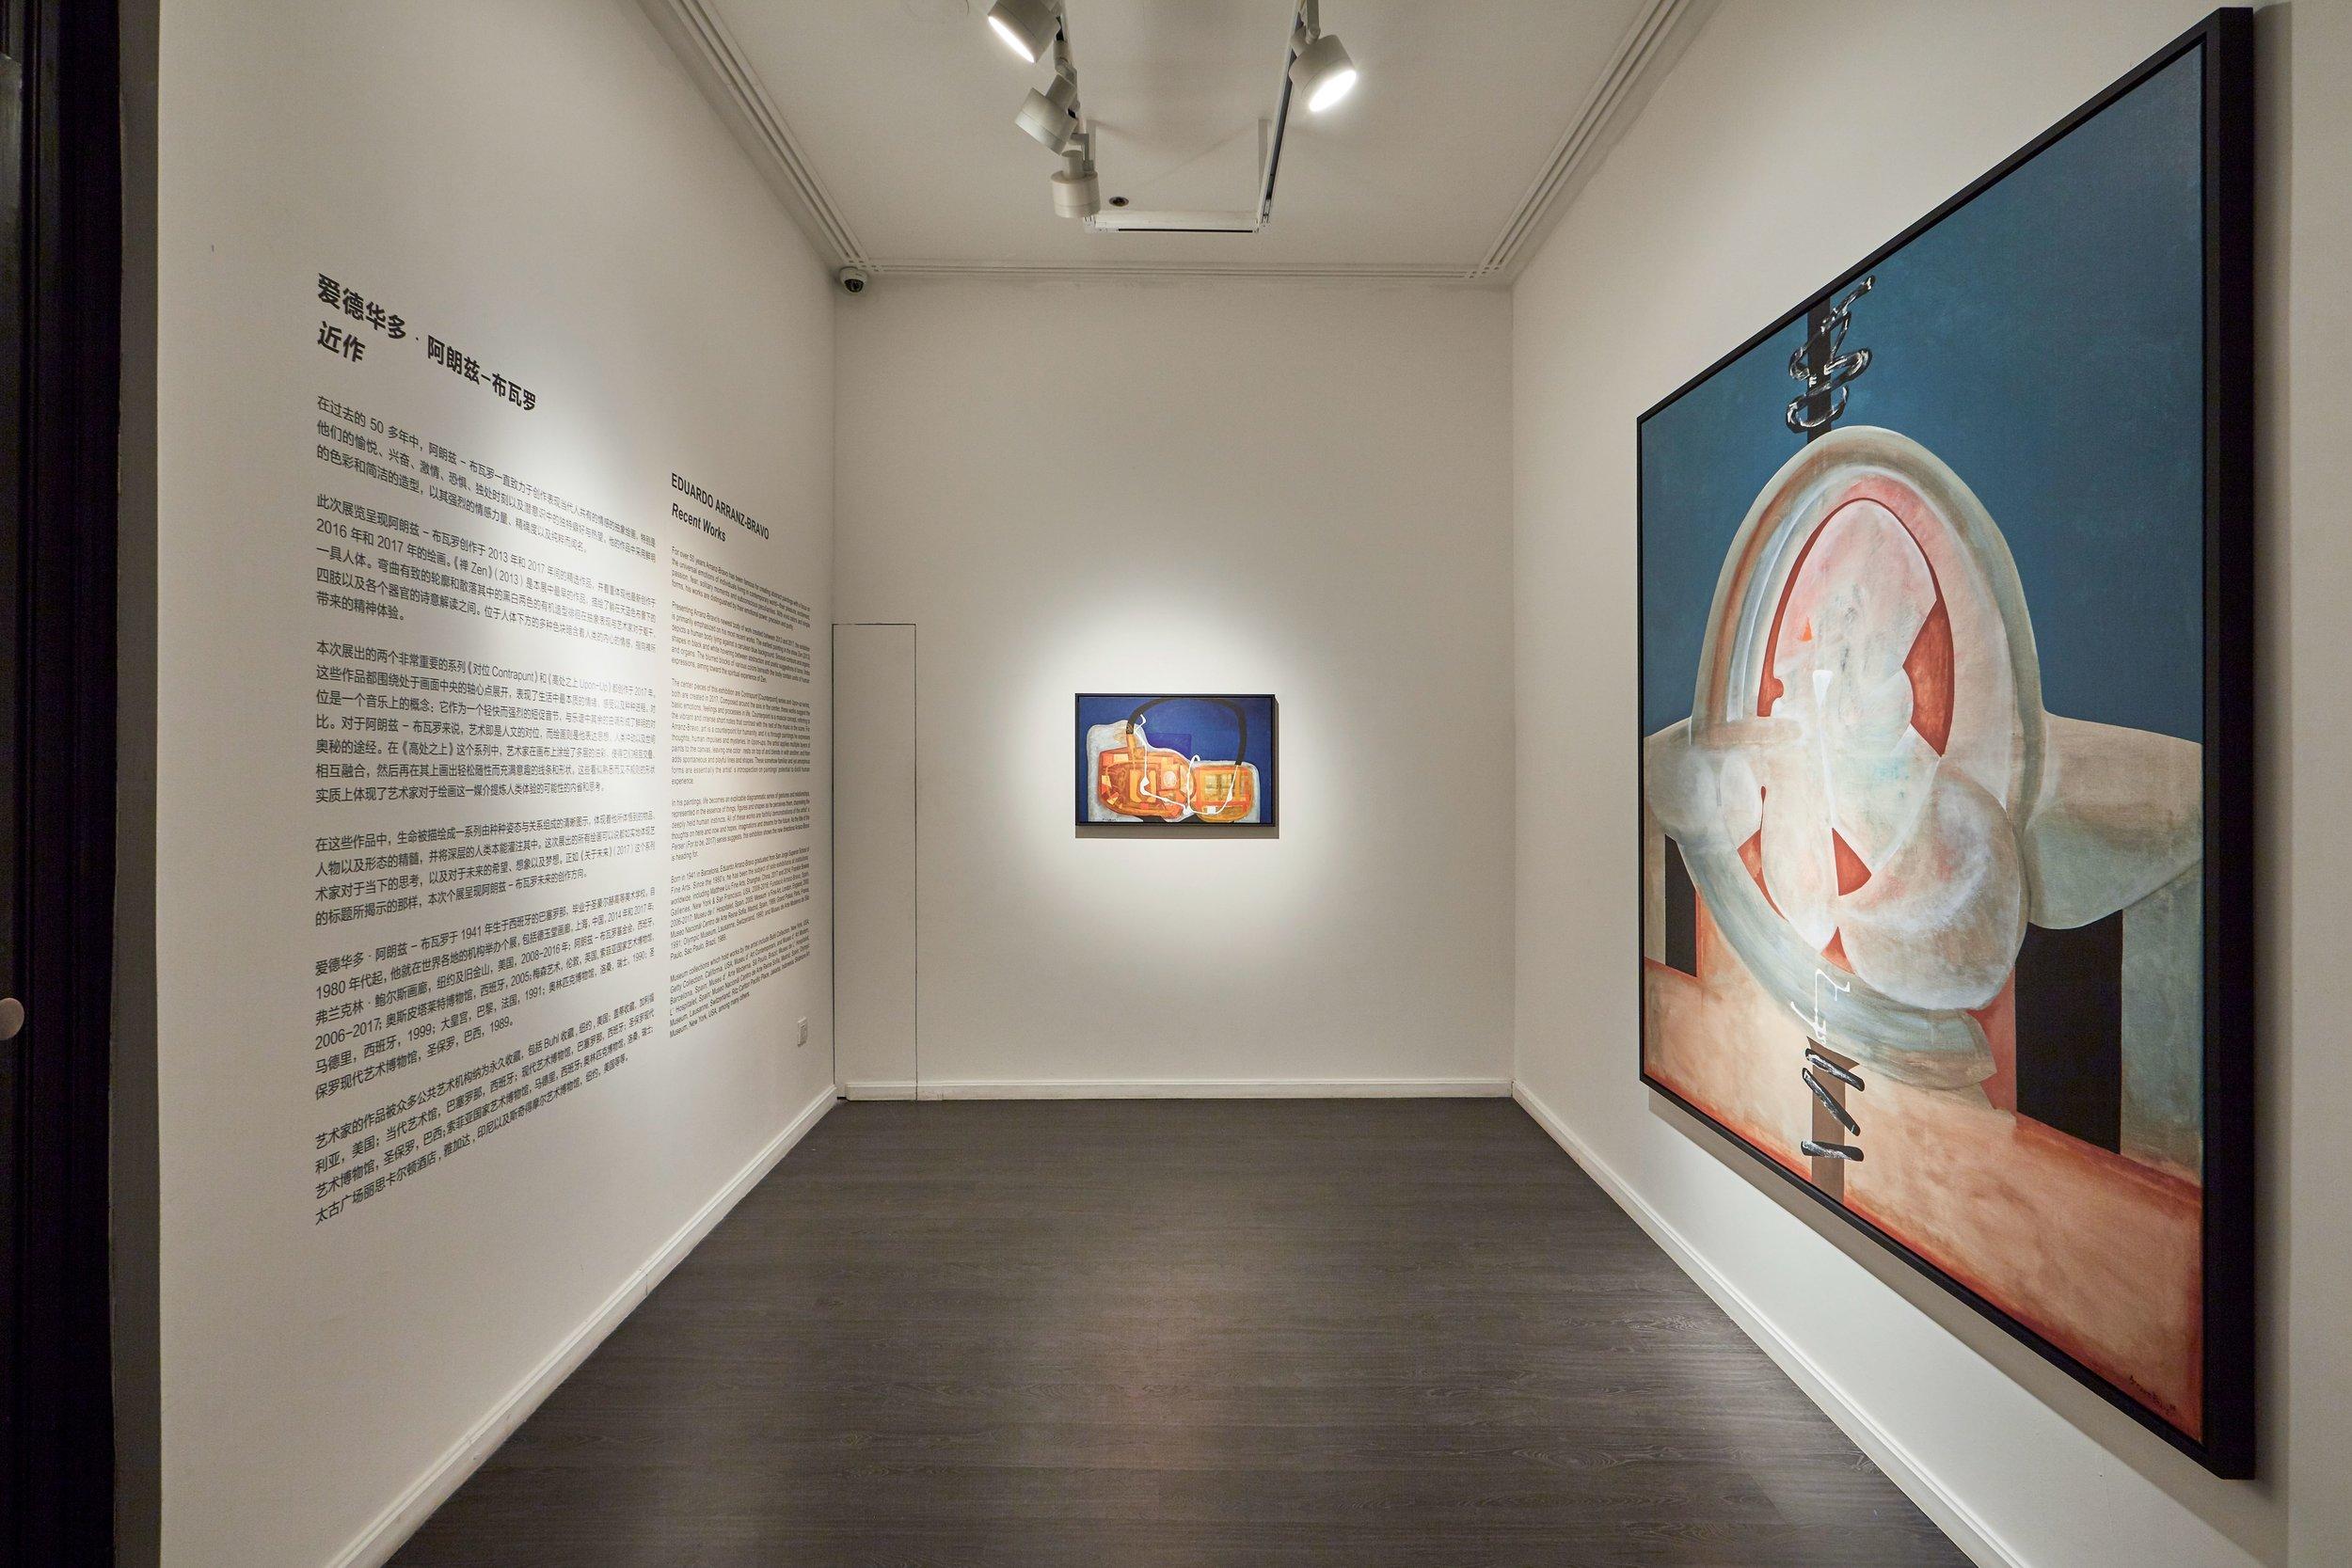 November 2018: Exhibited at the Shenzen Contemporary Art Fair